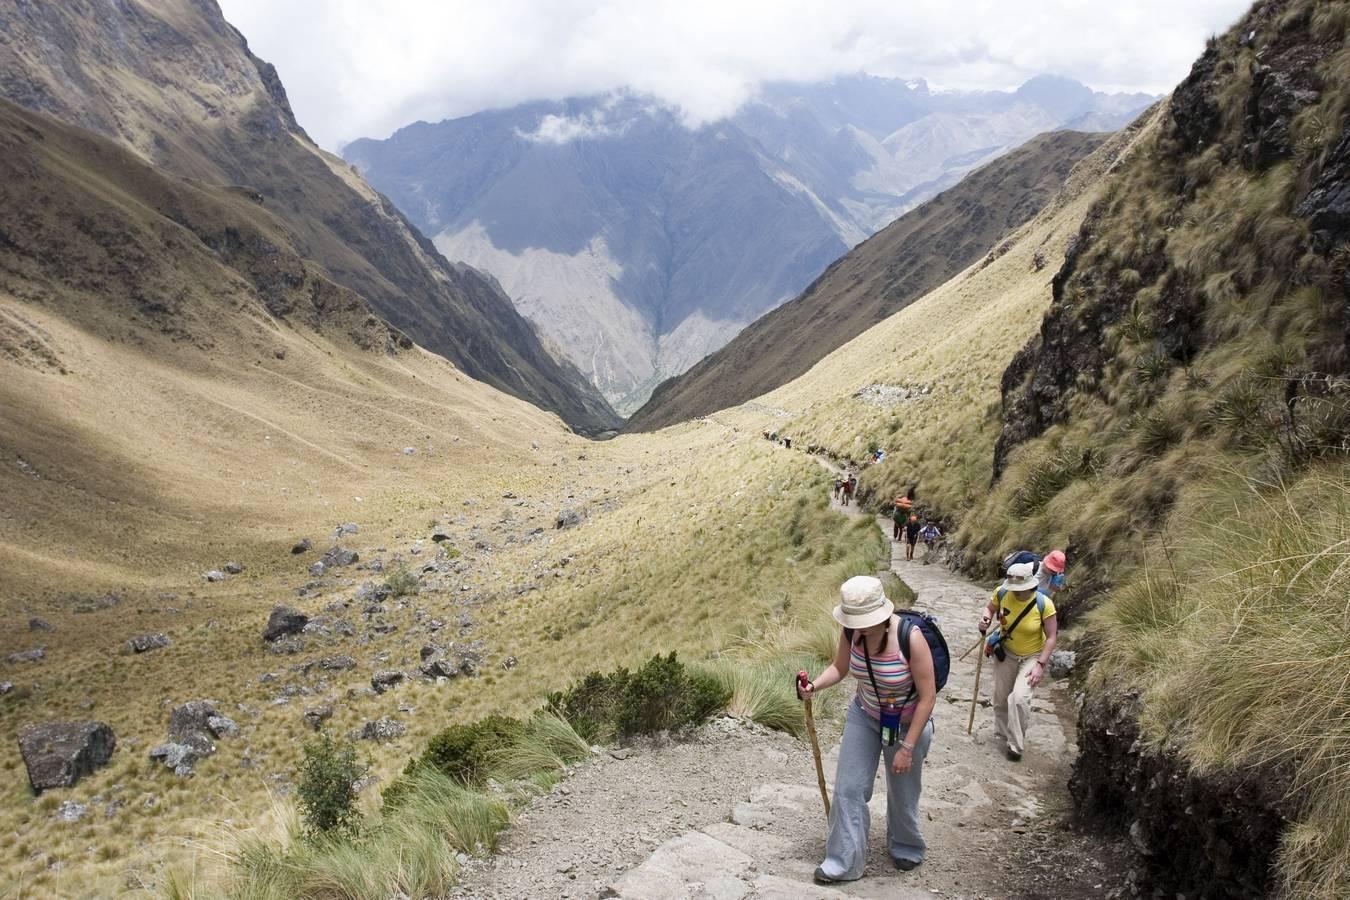 Vlak onder de top van de bergpas Warmi Wanuska of Dead Wowman's Pass